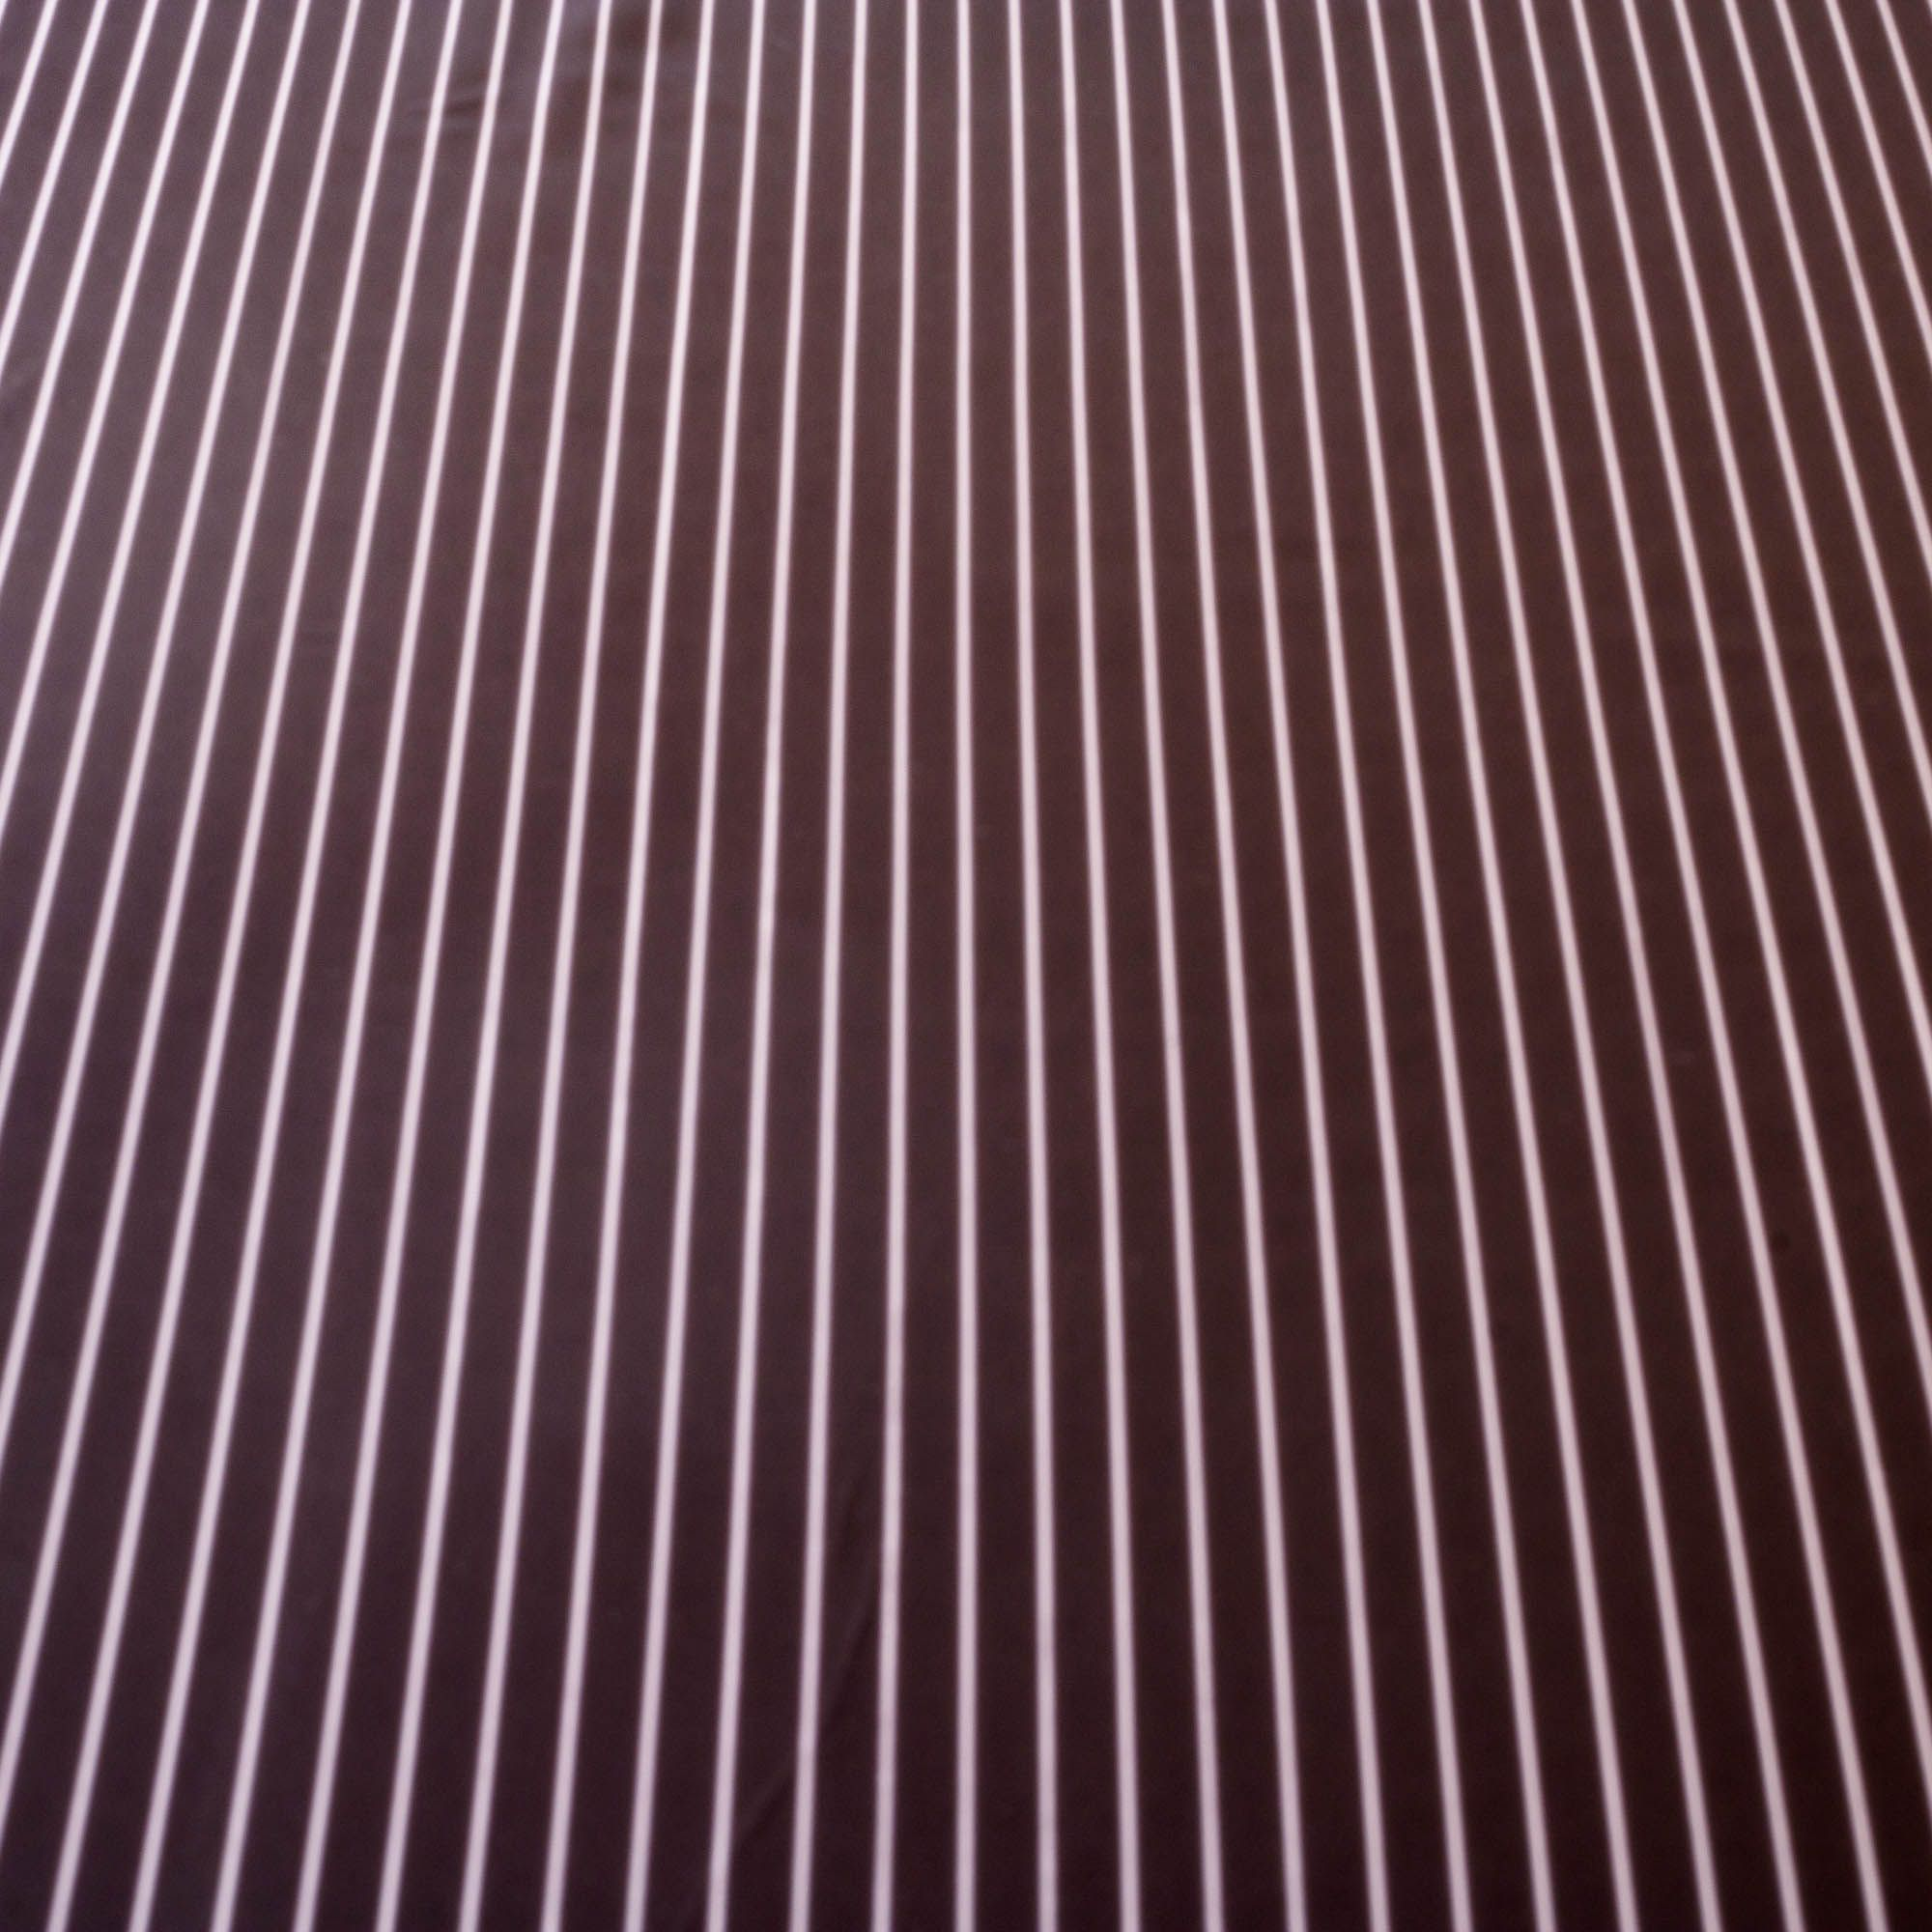 Tecido Crepe de Seda Listrado Preto 100% Poliester 1,50 m Largura